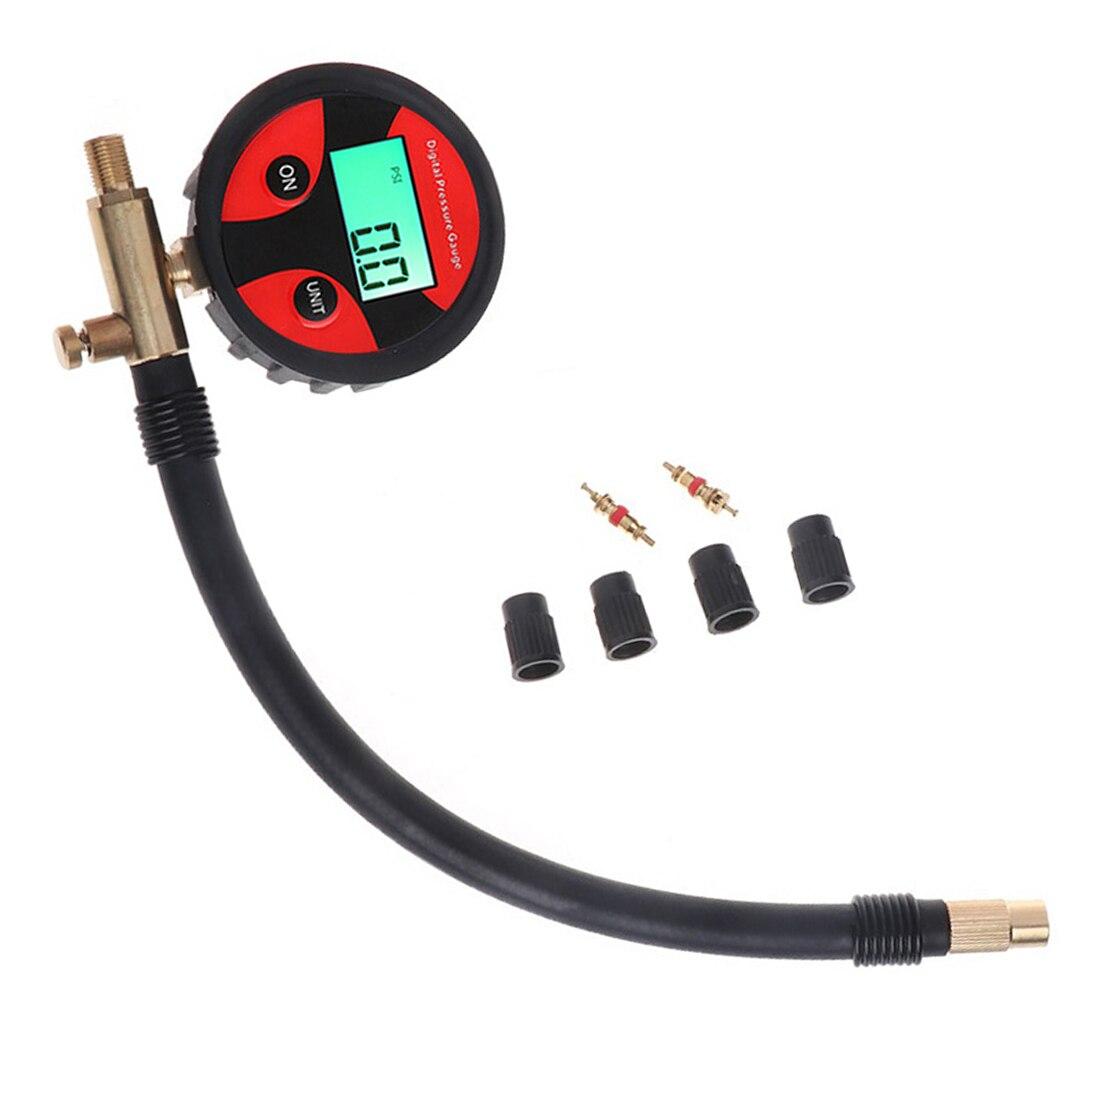 0-200PSI Digital Reifen reifen Manometer LCD Manometer Auto Lkw Motorrad Werkzeug